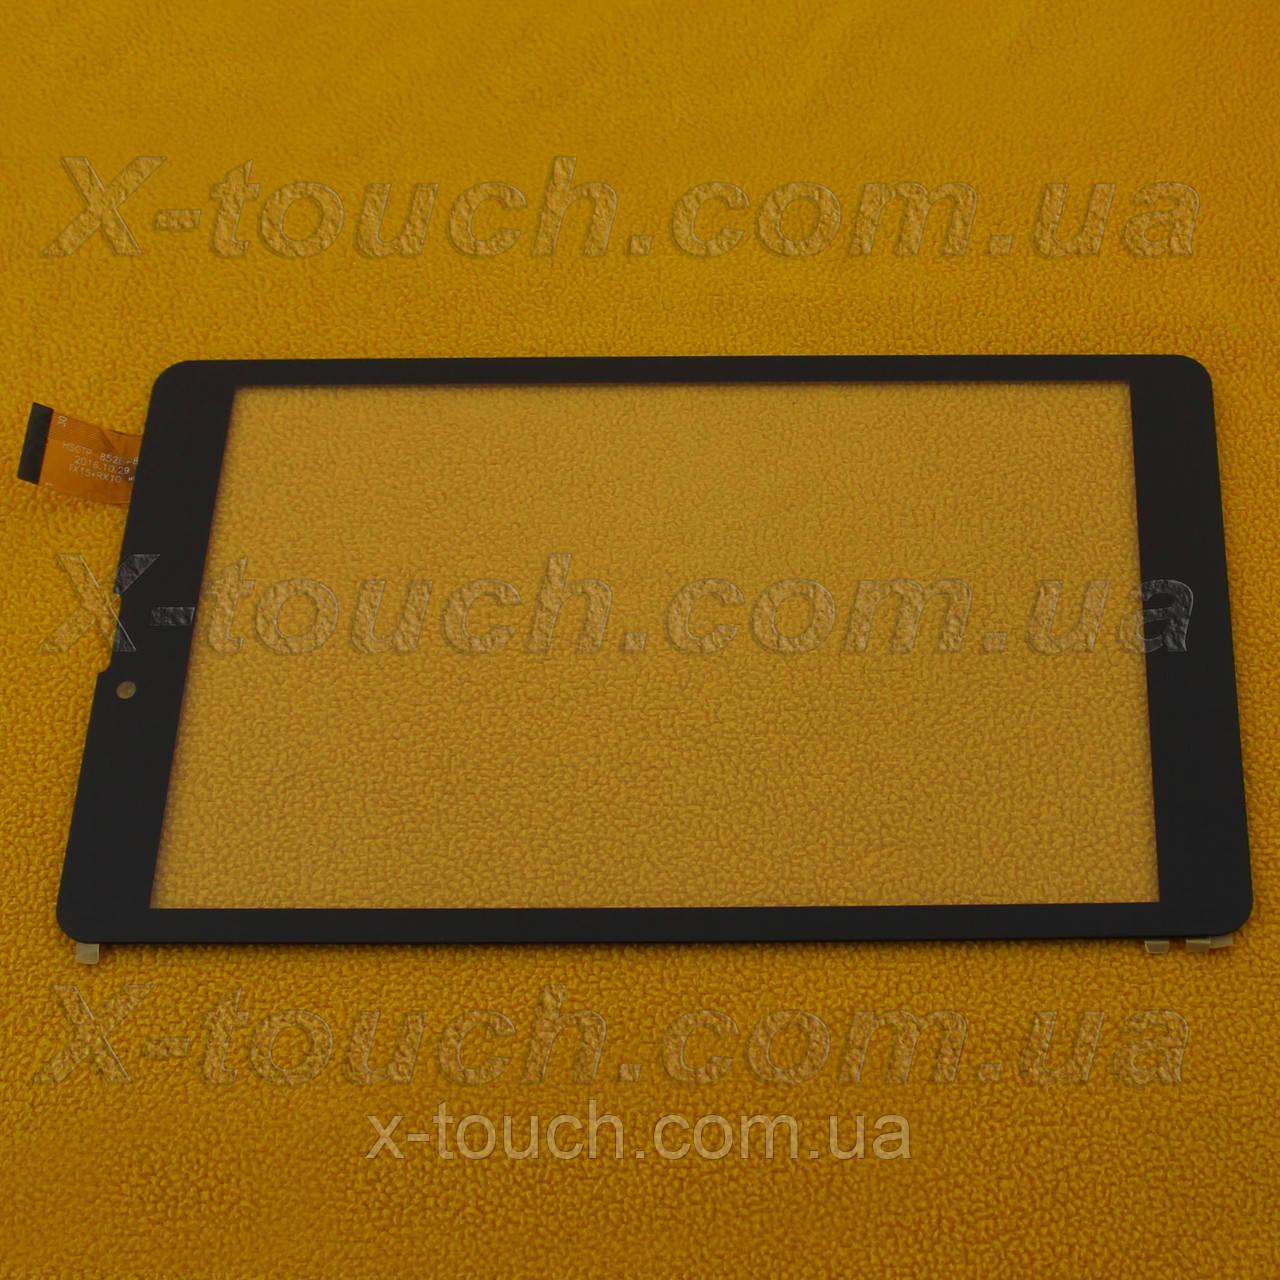 Тачскрин, сенсор PRESTIGIO MUZE PMT3718 3G для планшета